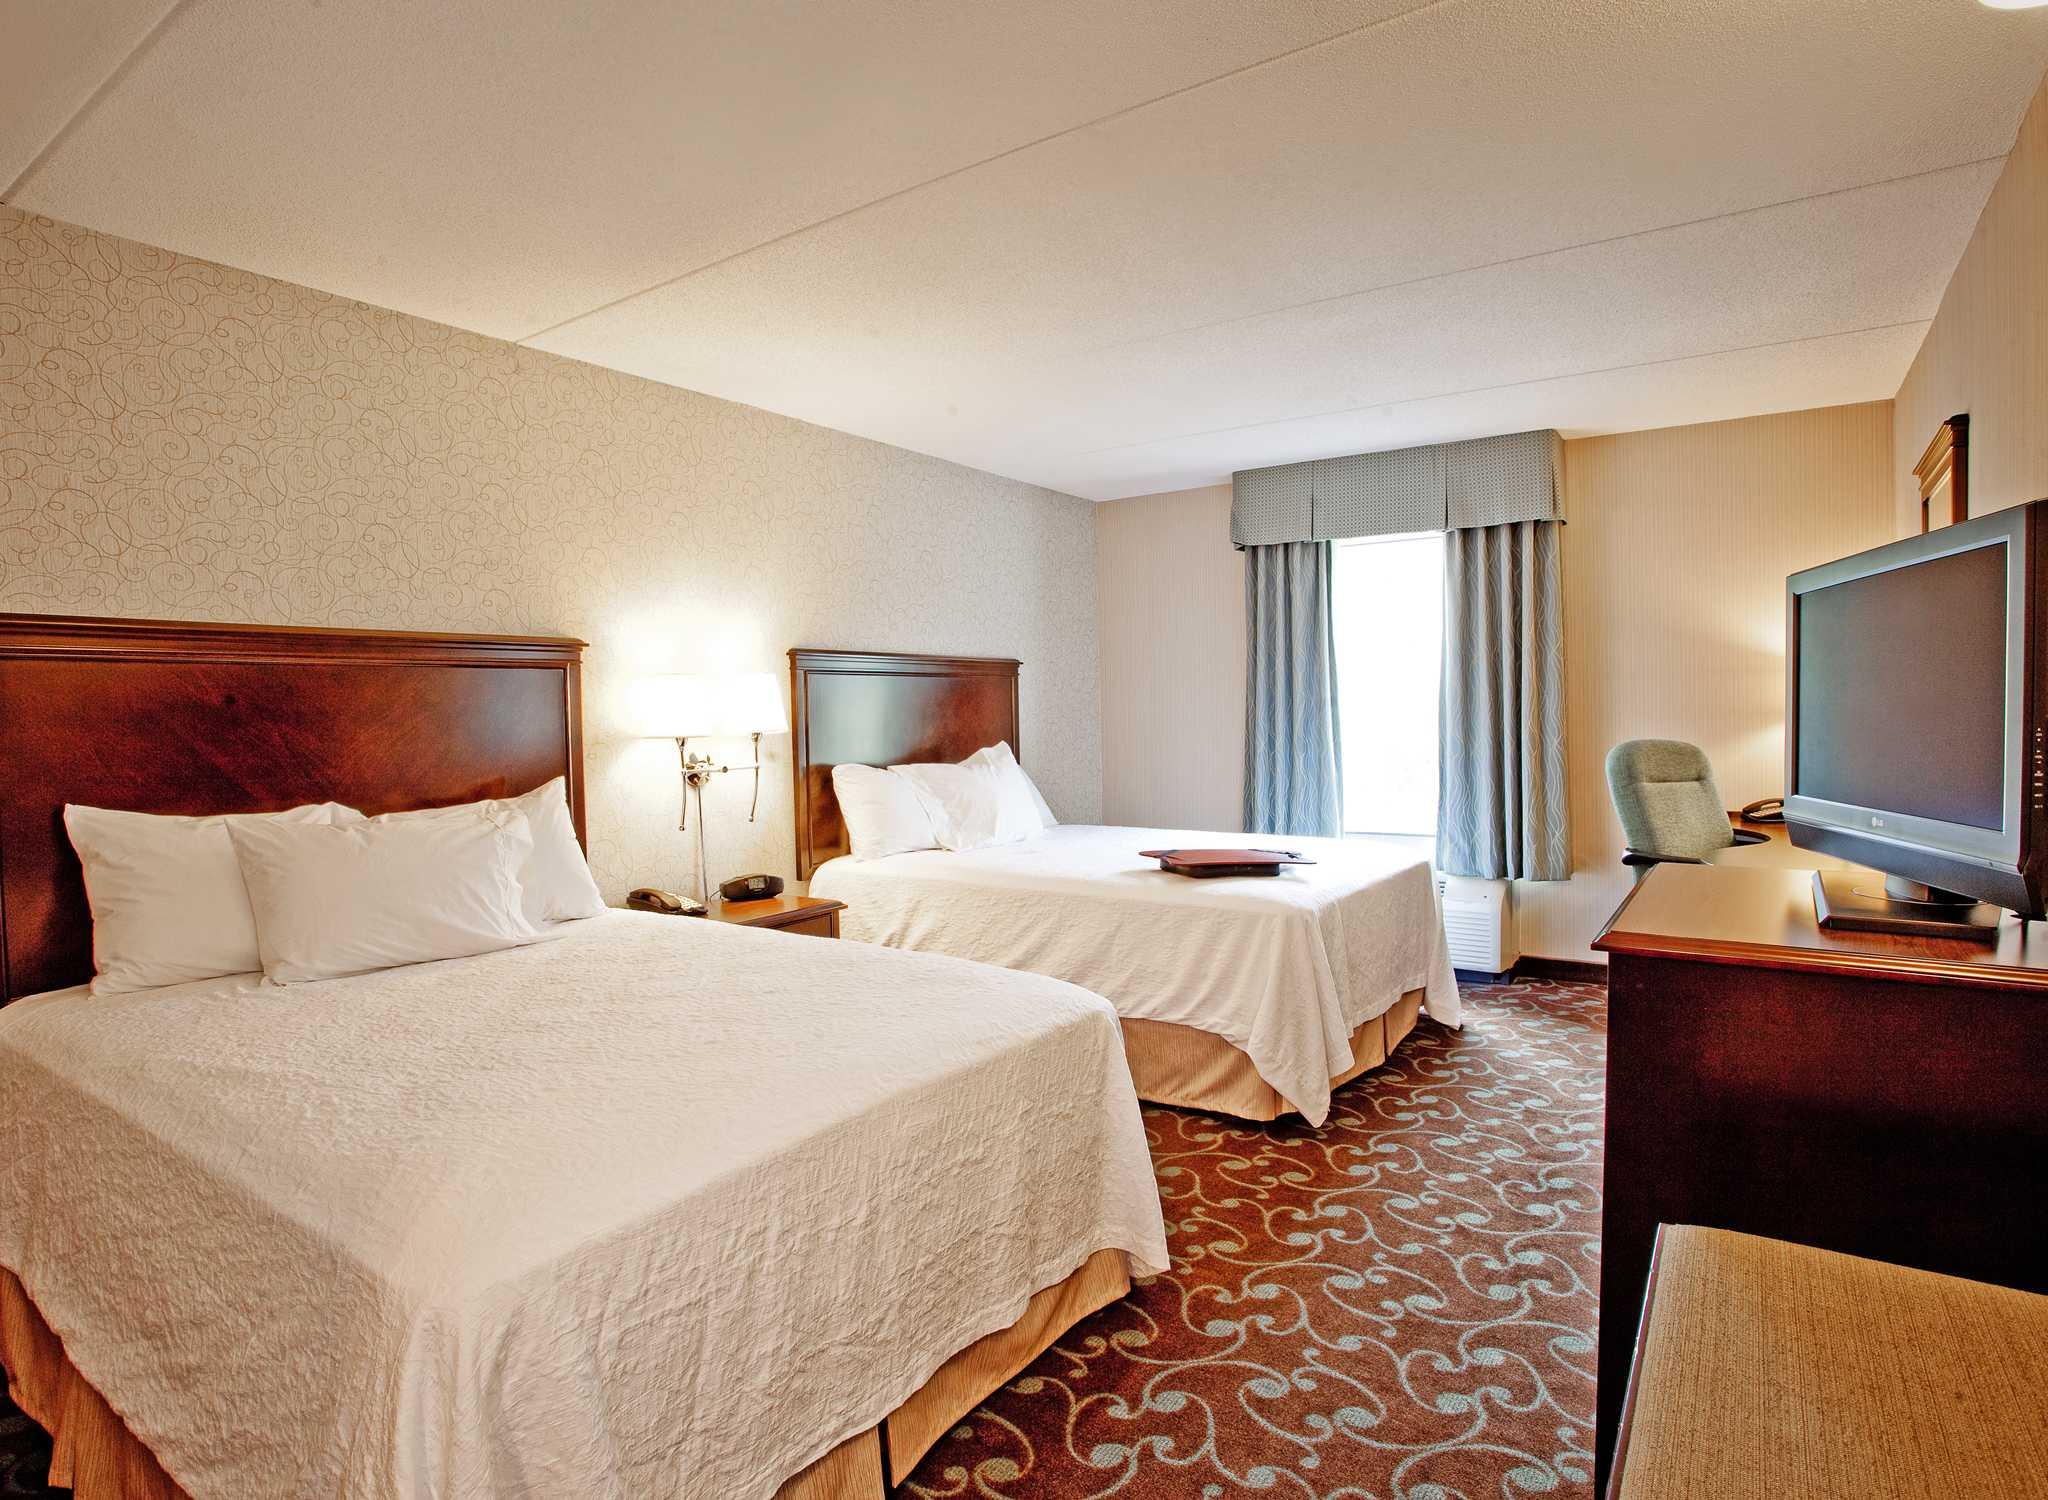 Htel Hampton Inn Suites By Hilton Barrie